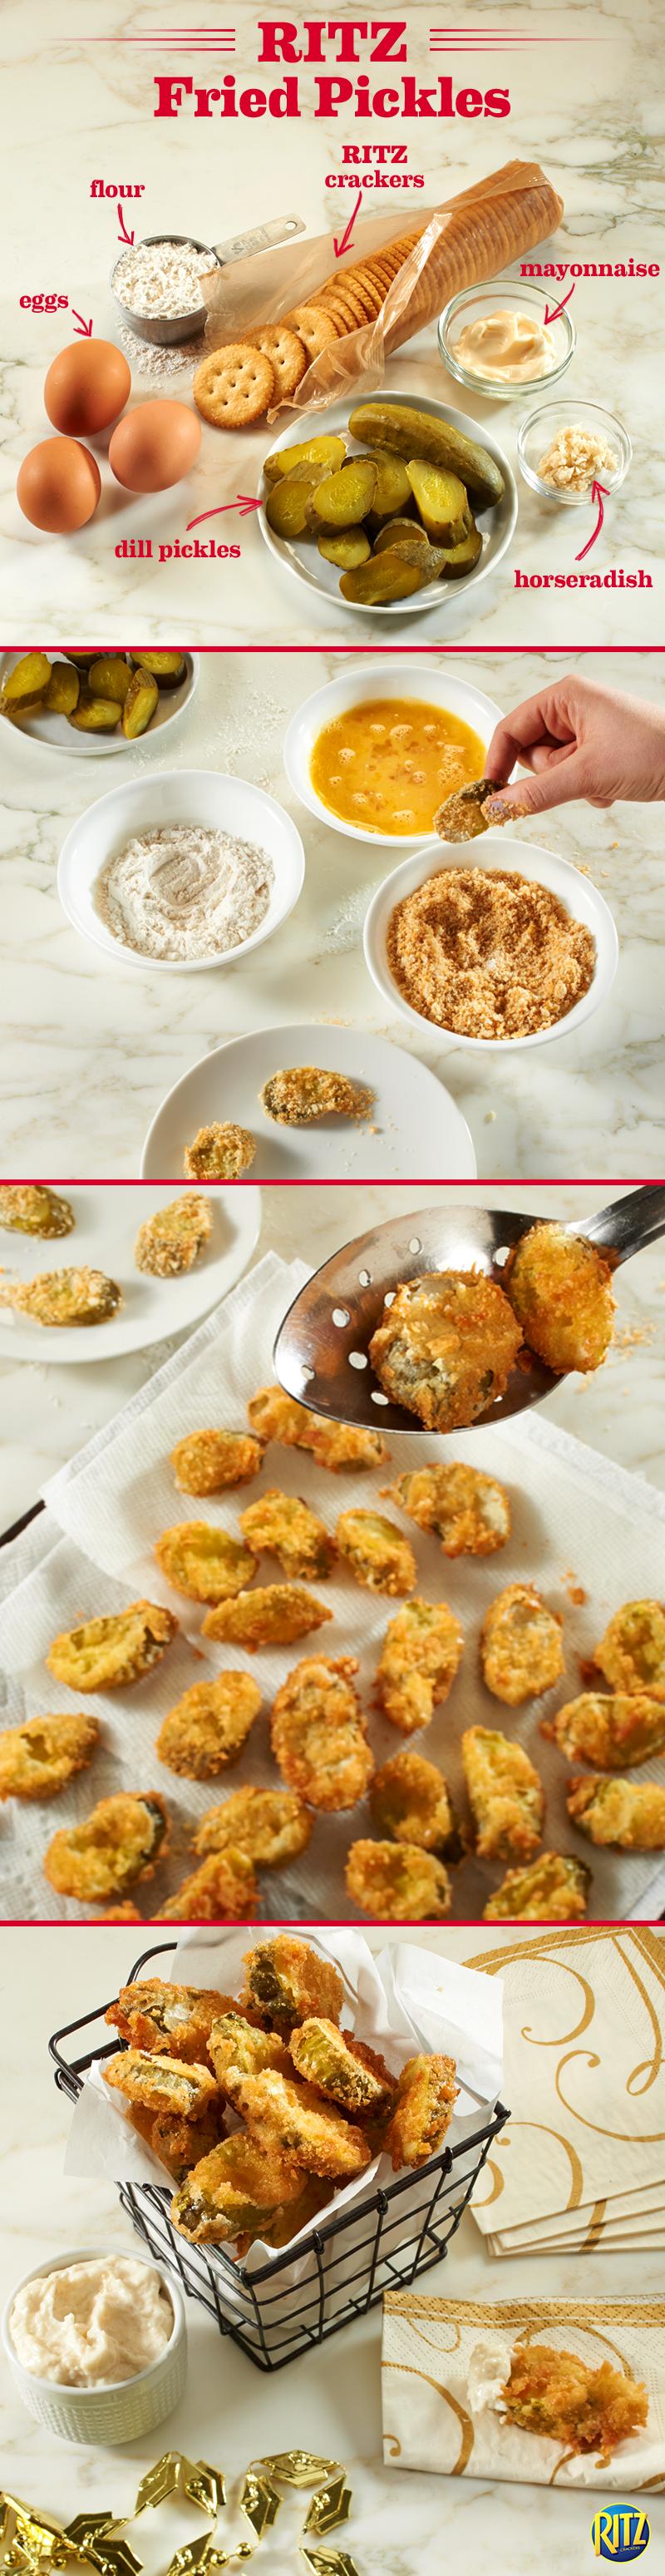 RITZ Fried Pickles Recipe Recipe Recipes, Cooking